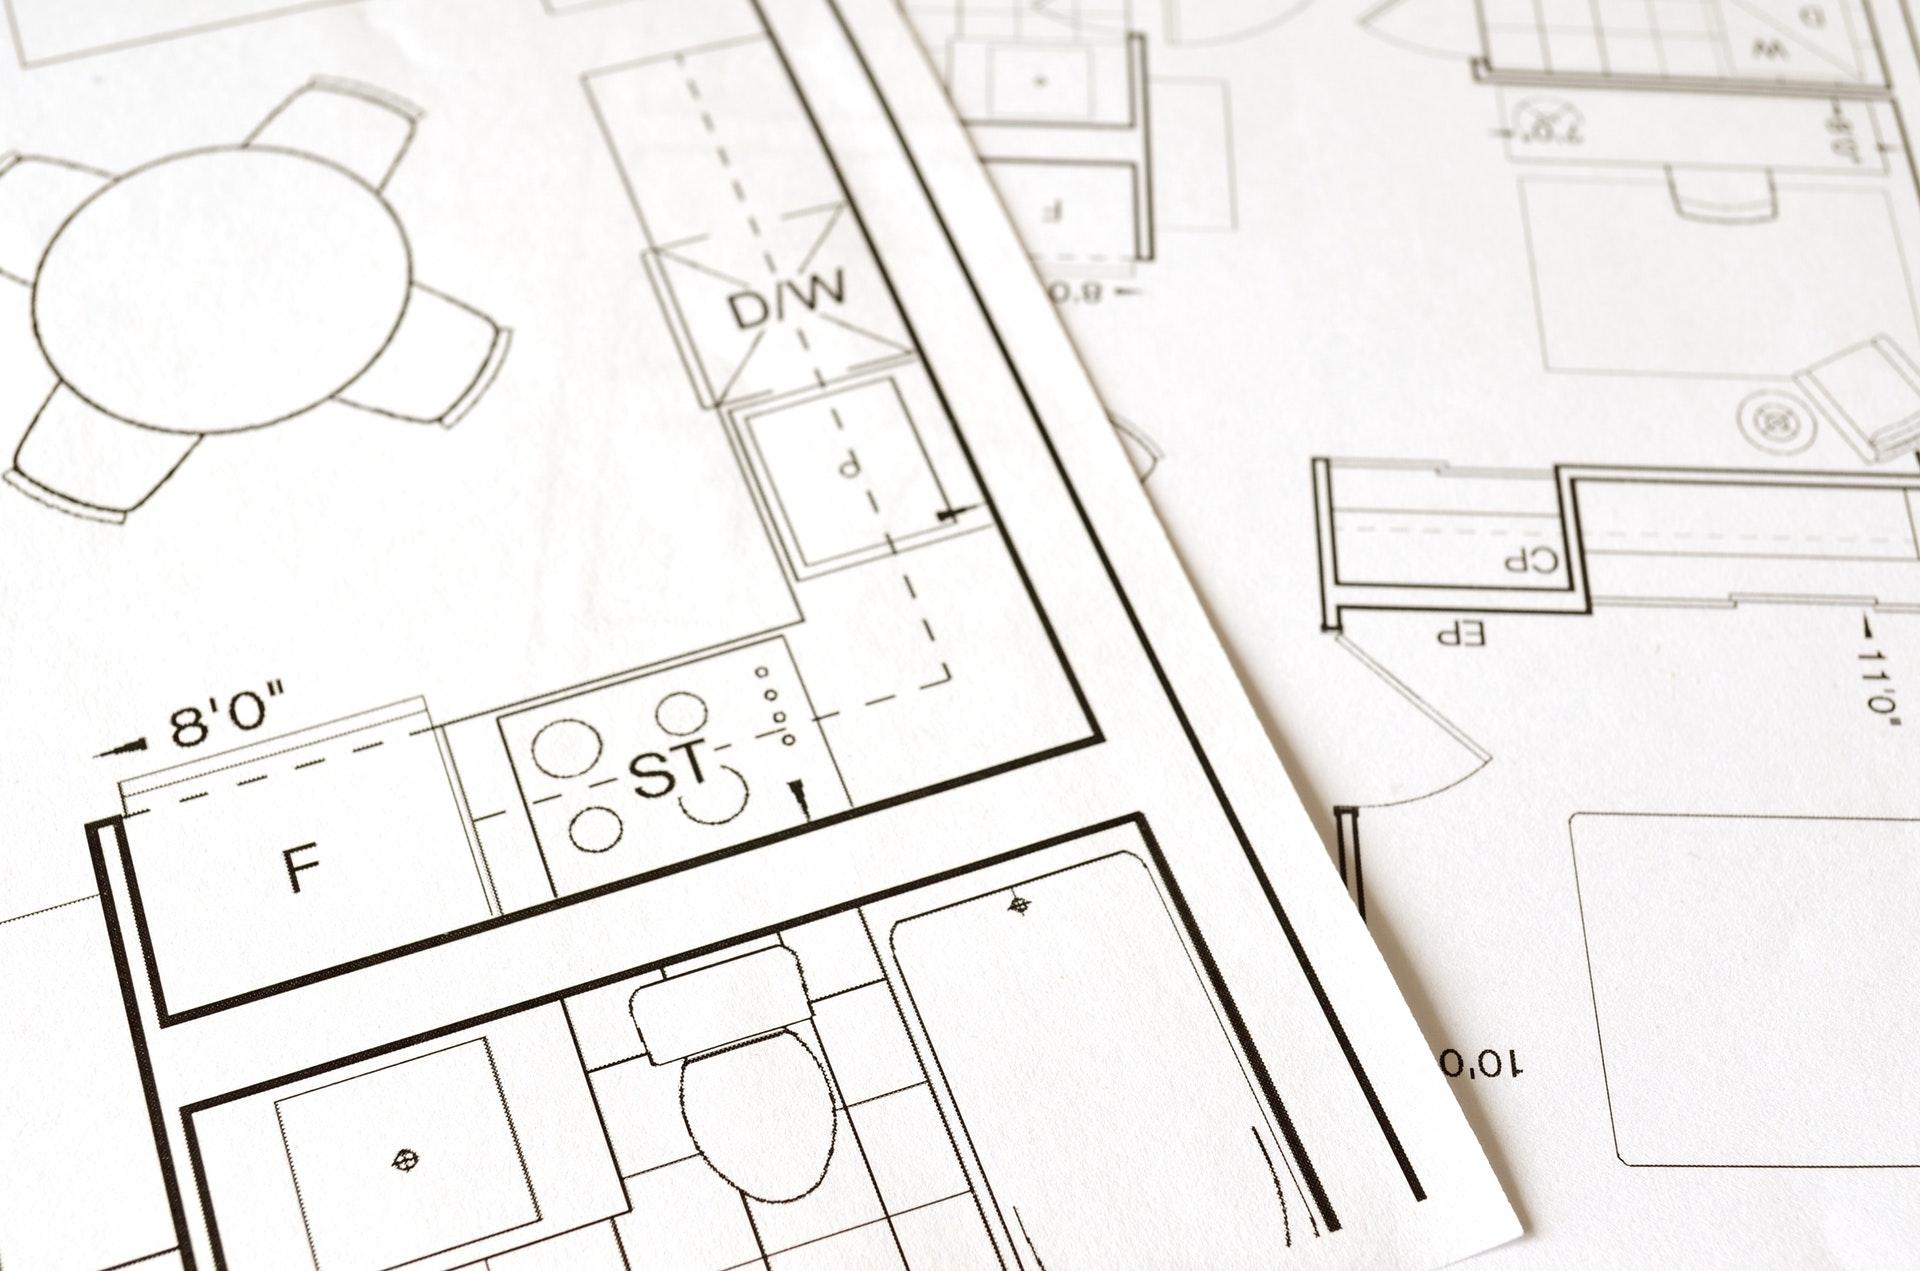 Building As Per The Plans